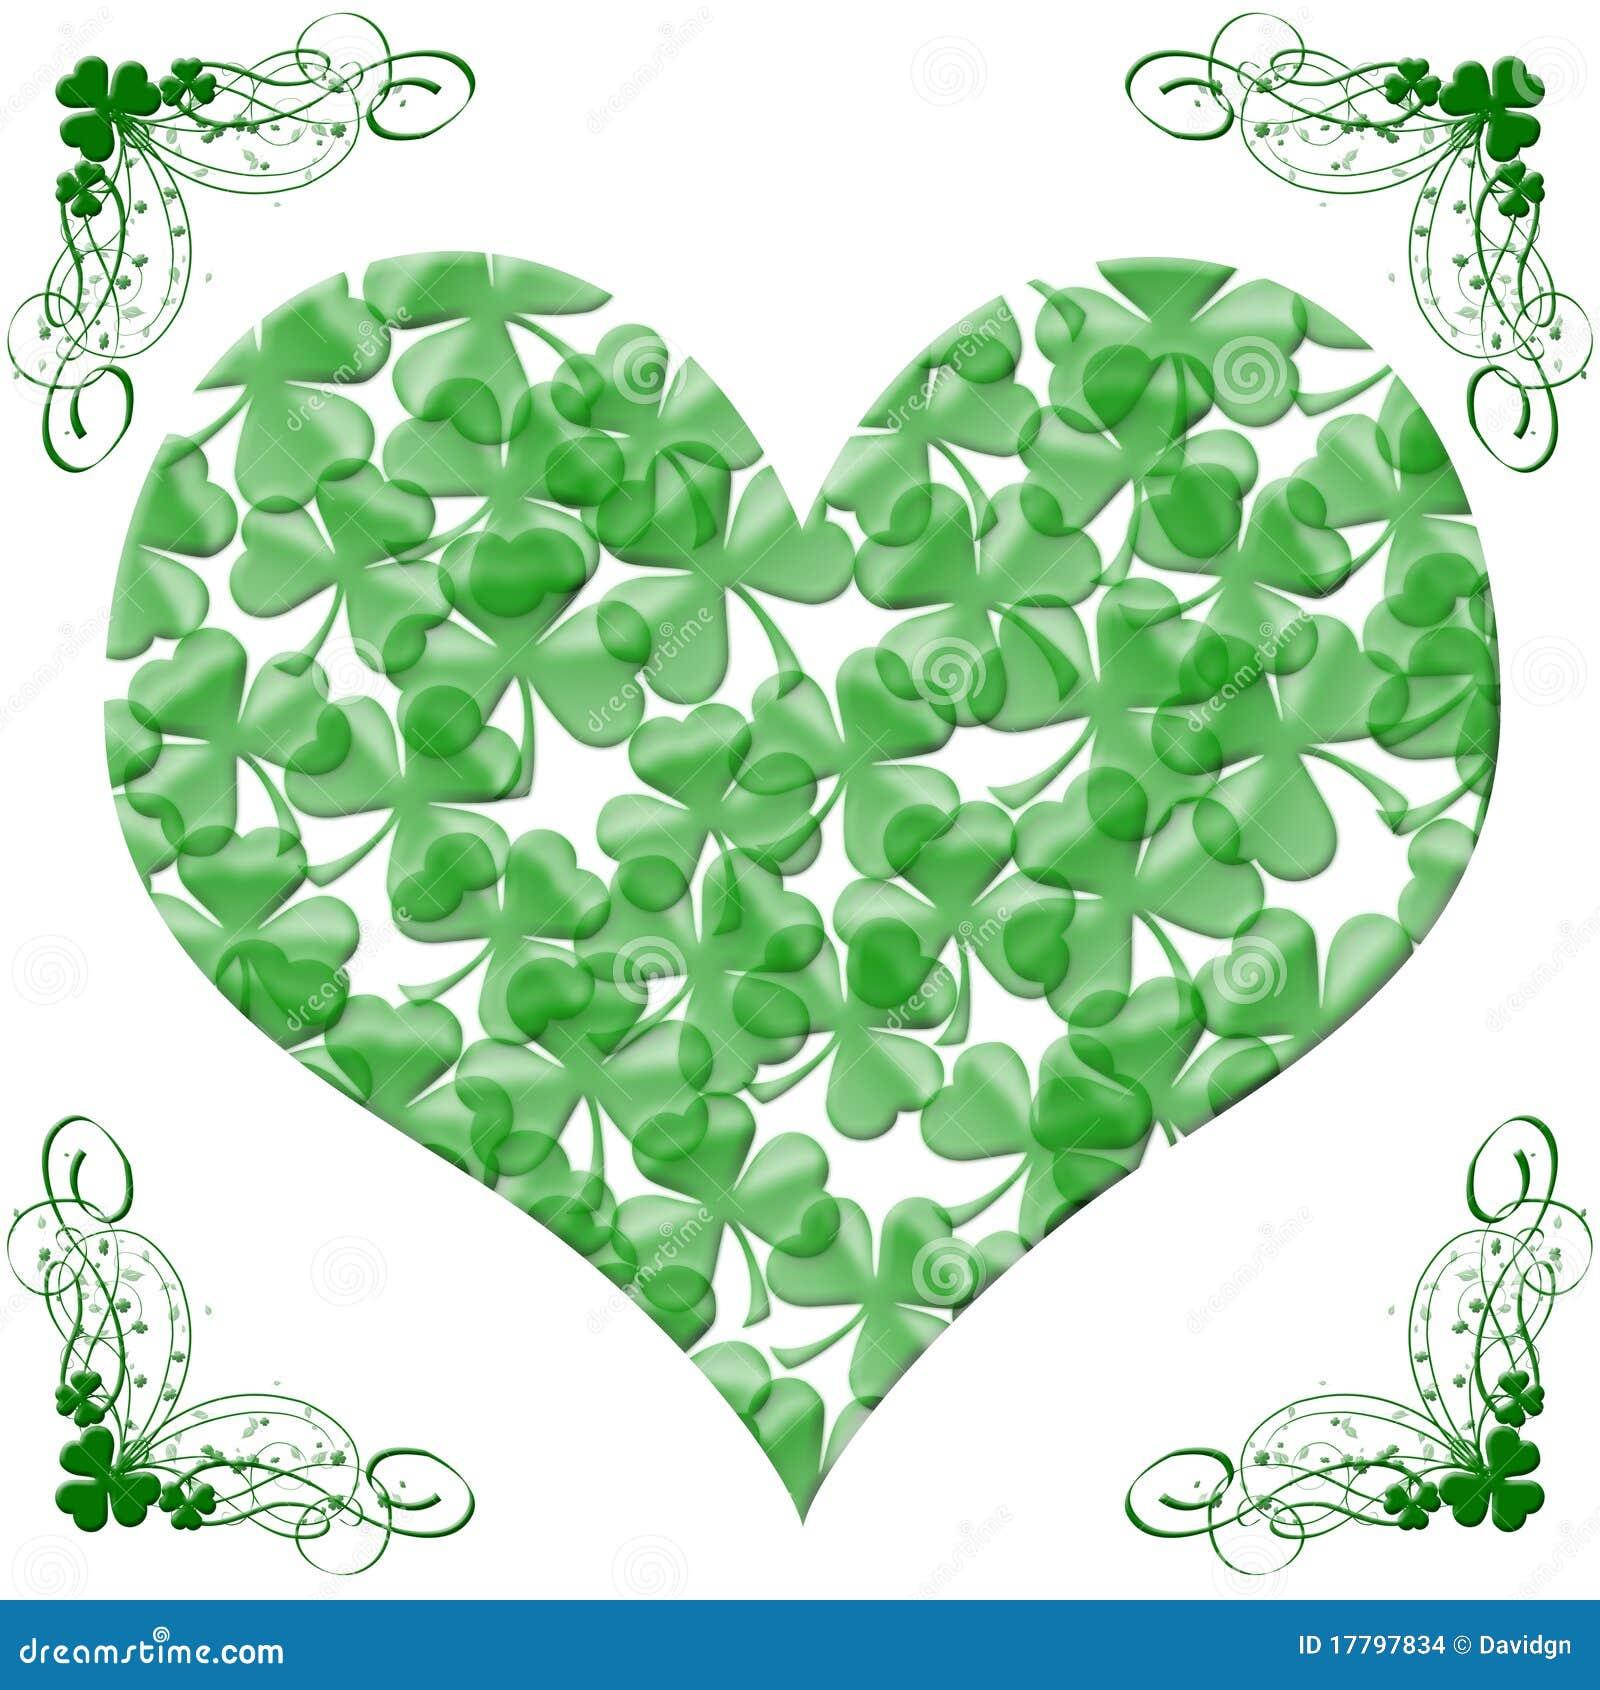 Happy st patricks day heart of shamrock leaves stock illustration happy st patricks day heart of shamrock leaves biocorpaavc Gallery